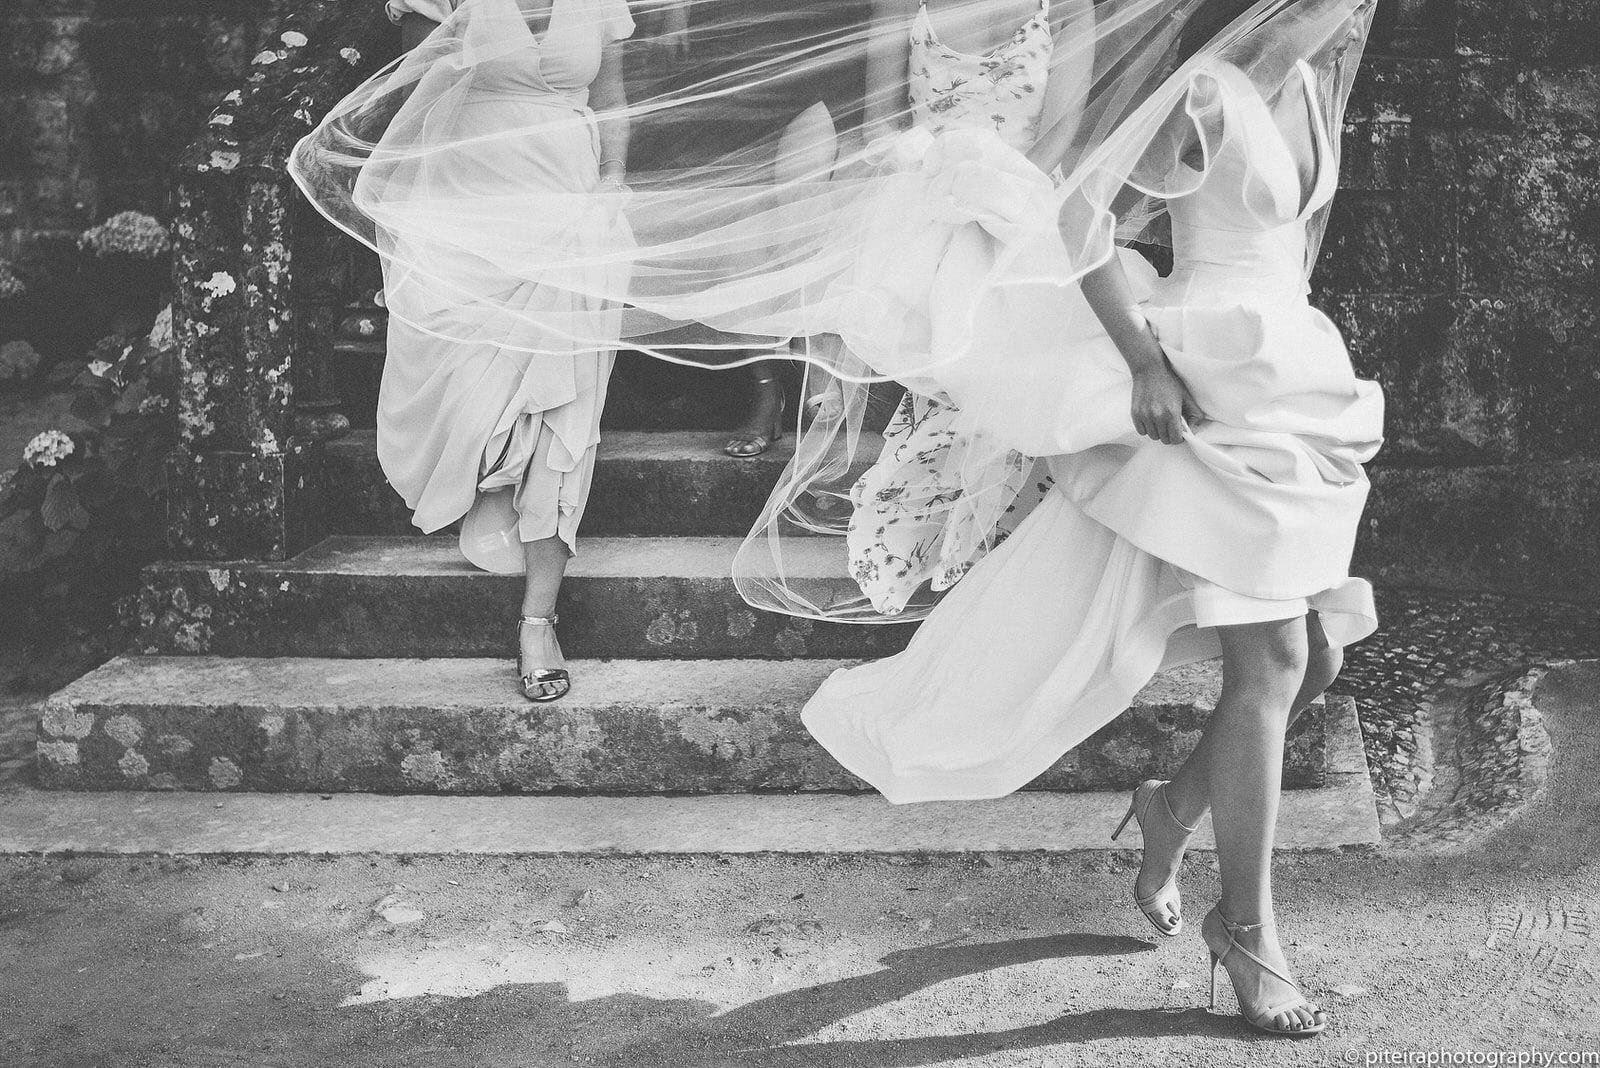 Piteira Photography-61-1-1